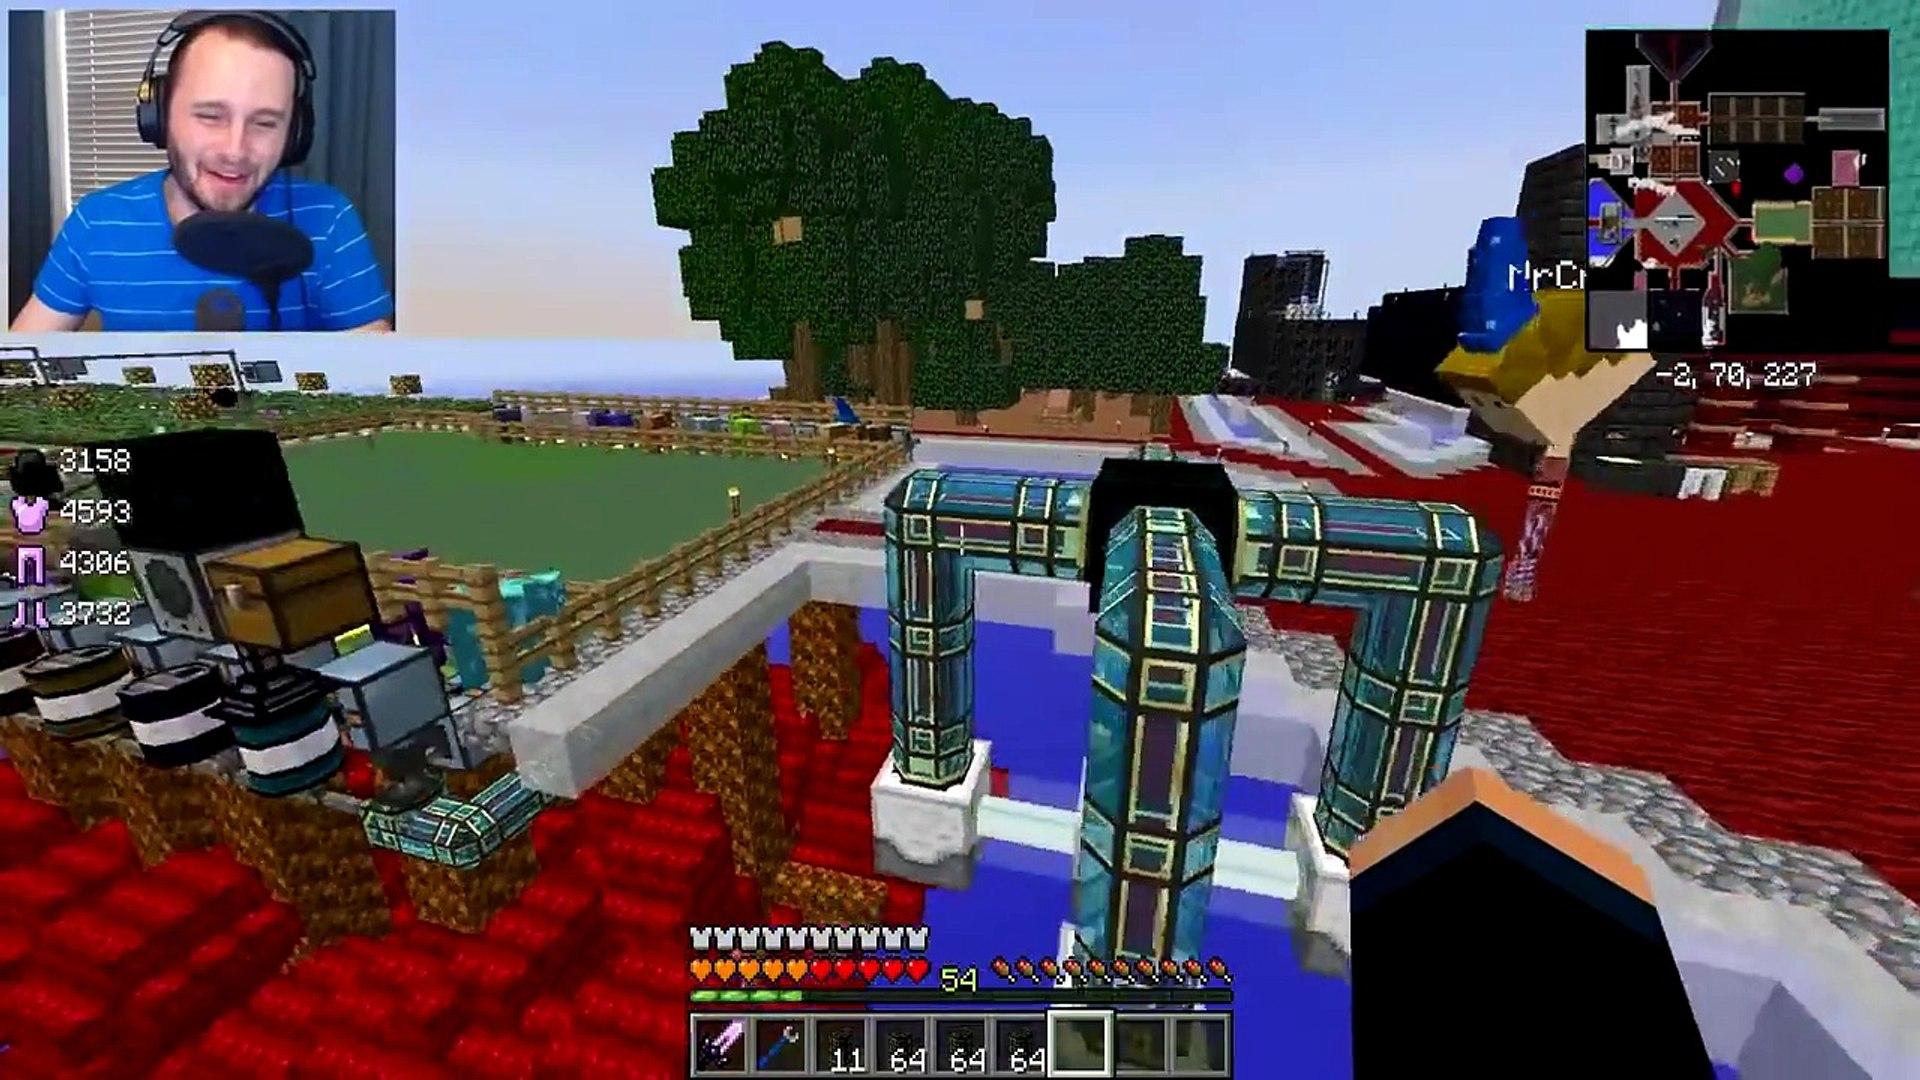 SSundee | Minecraft SkyFactory 2 THE PSEUDO RITUAL!! [34]